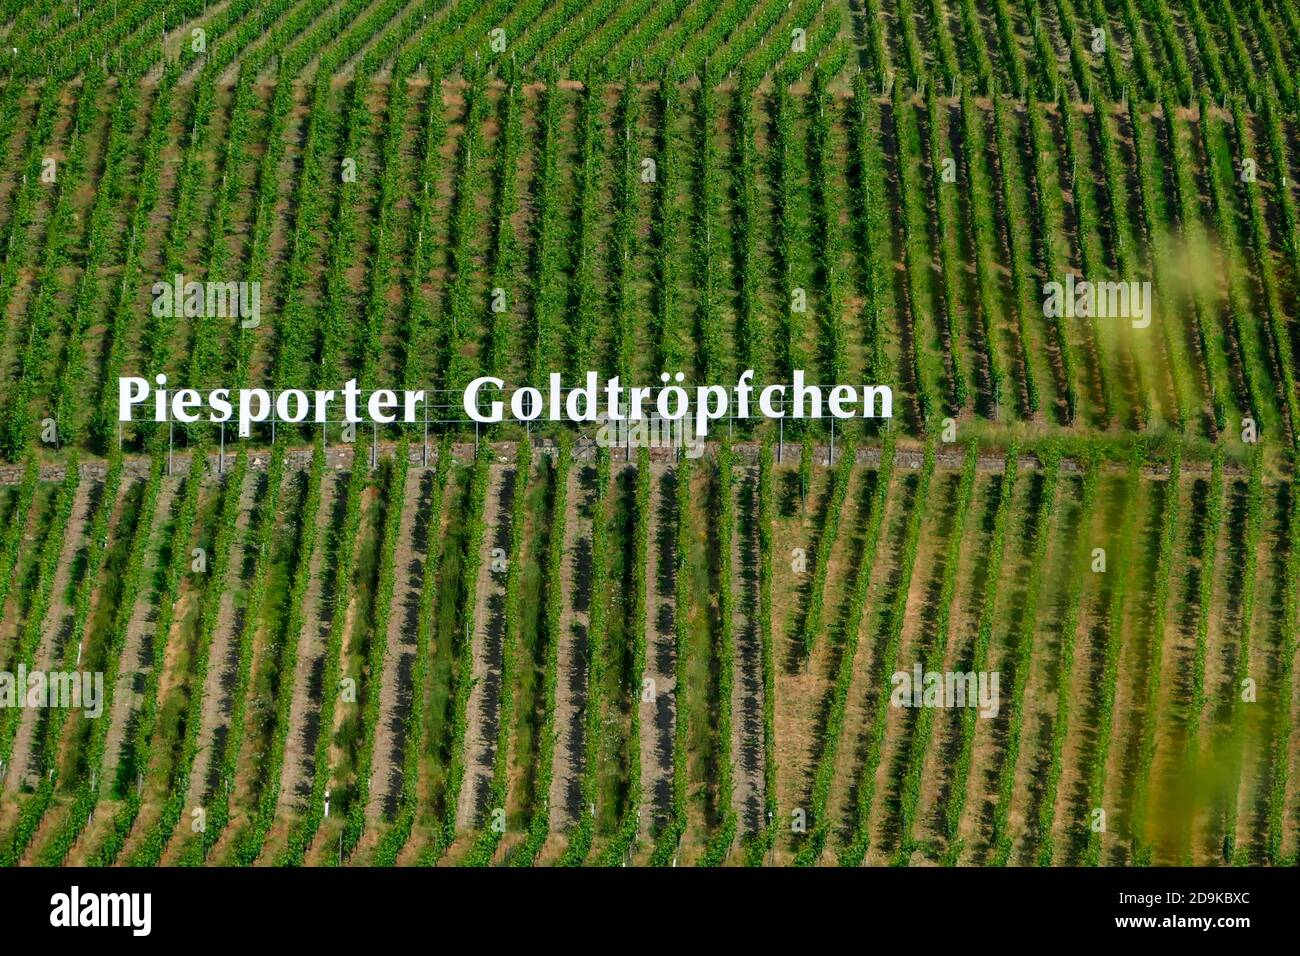 Weinberg, Piesport, Rheinland-Pflaz, Germany Stock Photo